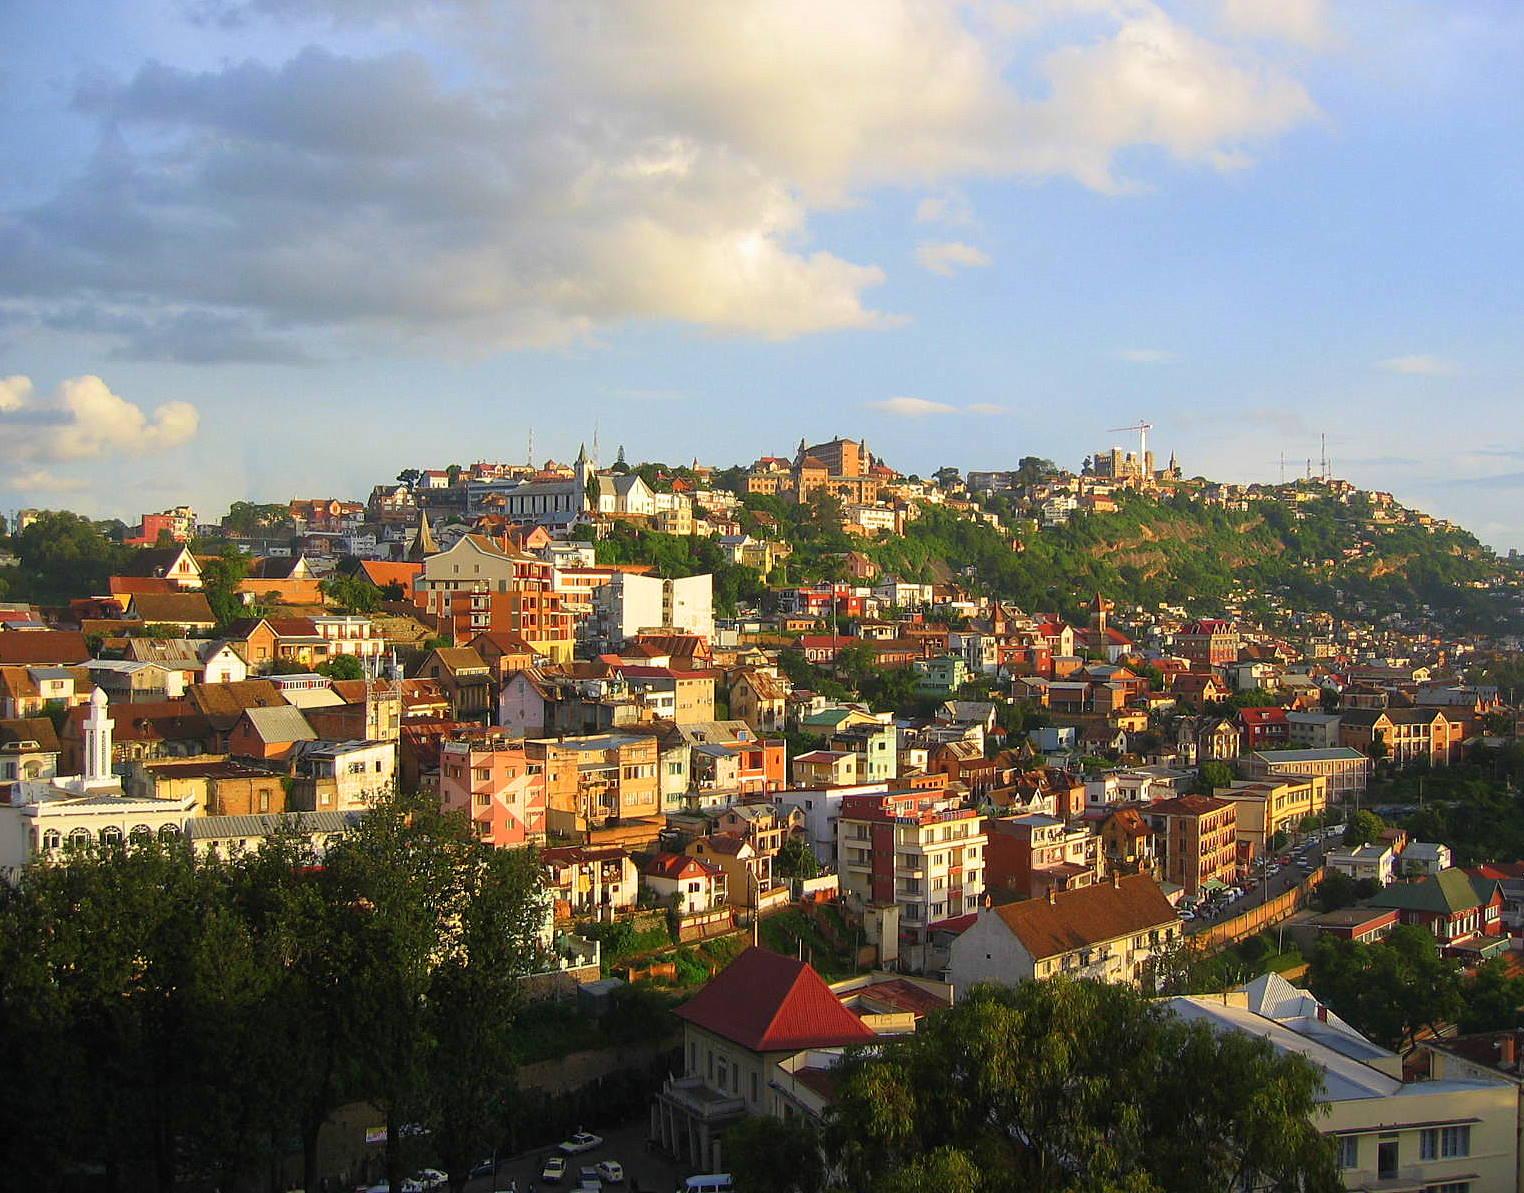 Antananarivo dating site - free online dating in Antananarivo (Madagascar)